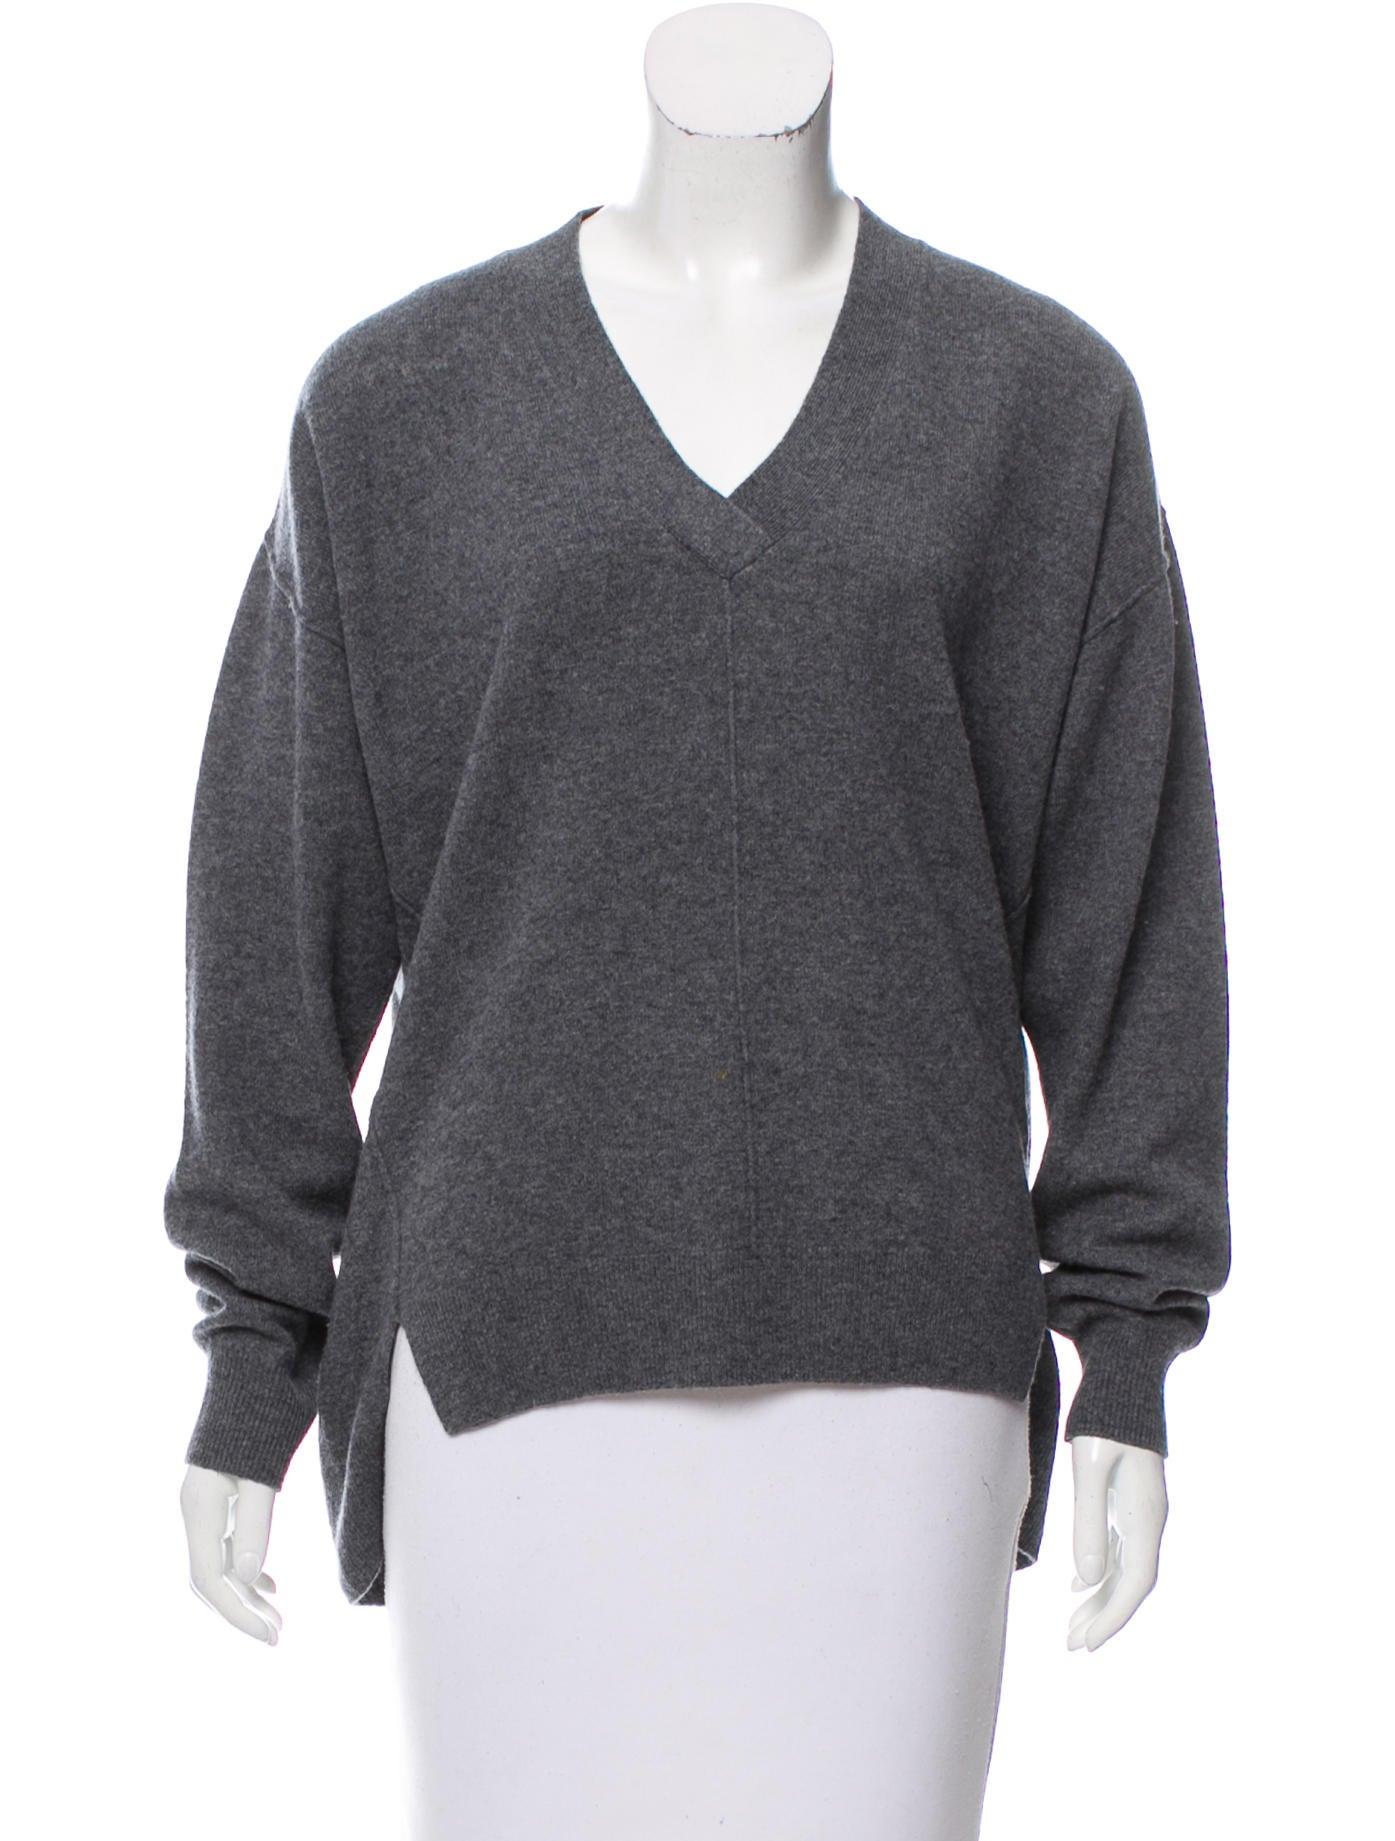 Joseph Oversize Wool Sweater - Clothing - JOS24865 | The RealReal